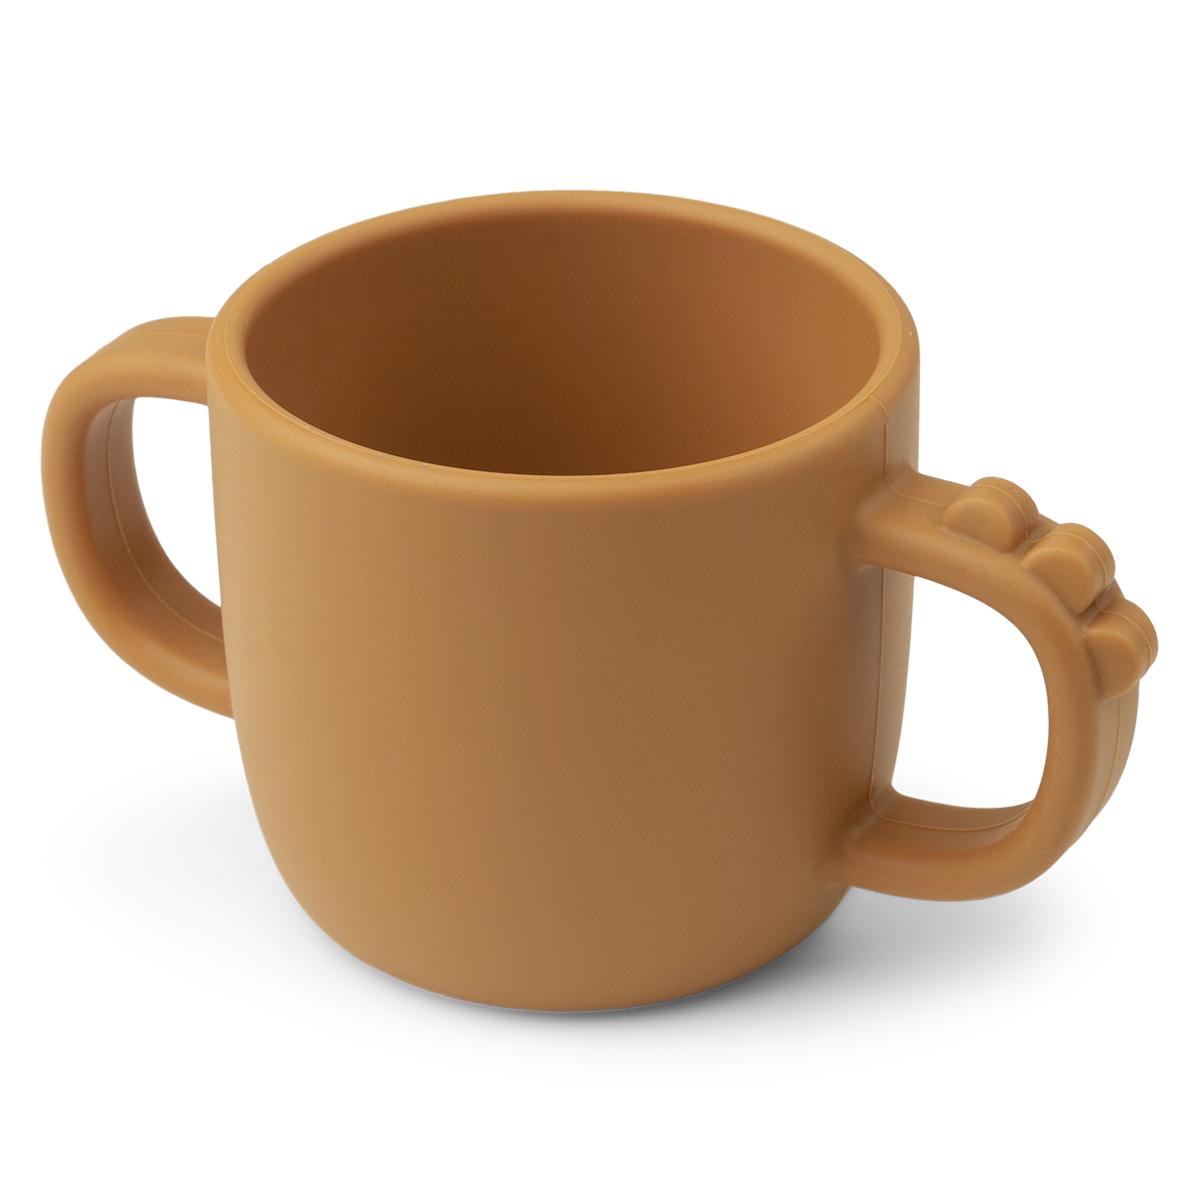 Tasse & Verre Tasse Peekaboo Croco - Moutarde Tasse Peekaboo Croco - Moutarde